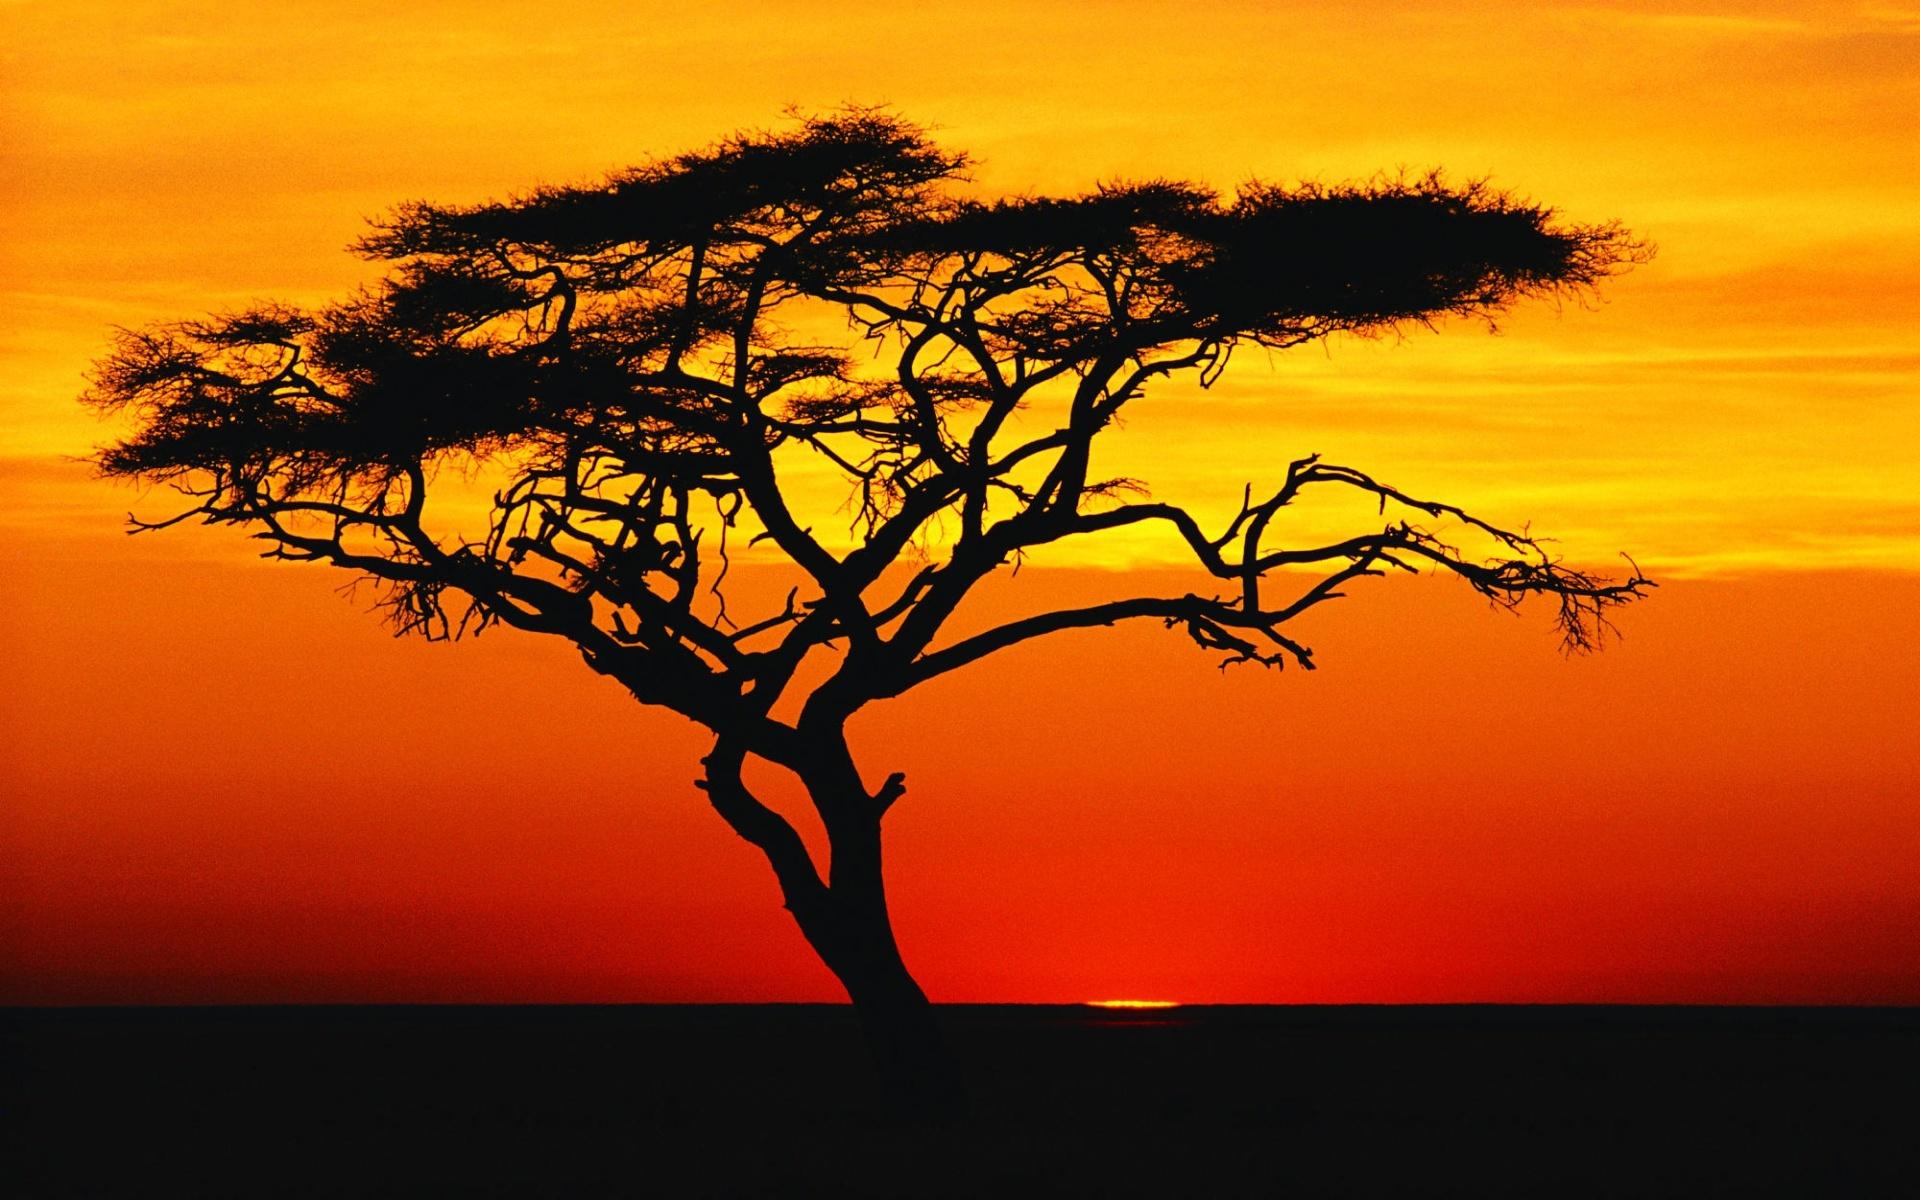 Sunset plant silhouette